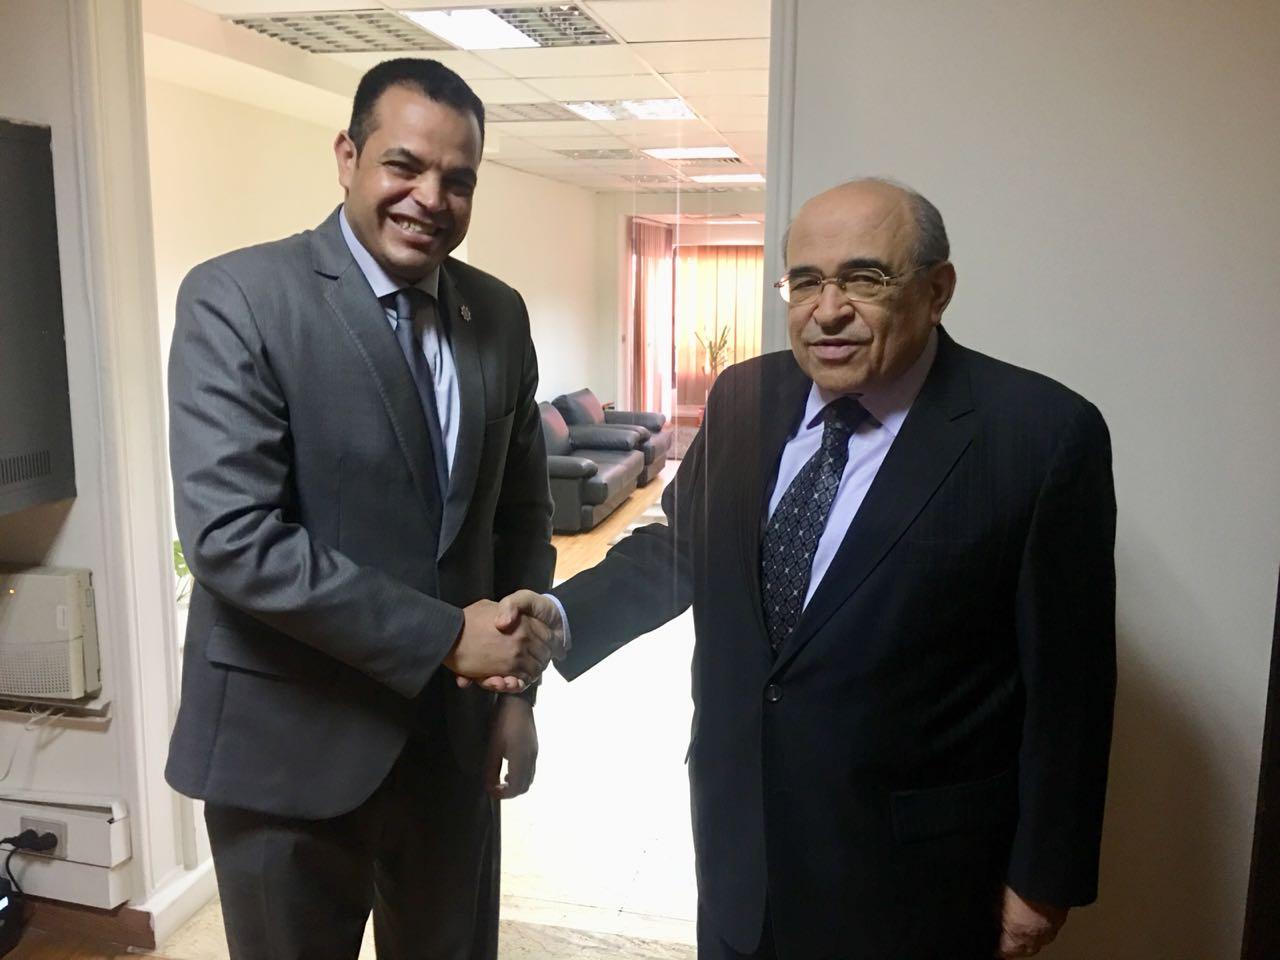 حوار أخبار مصر مع مصطفى الفقى  (4)